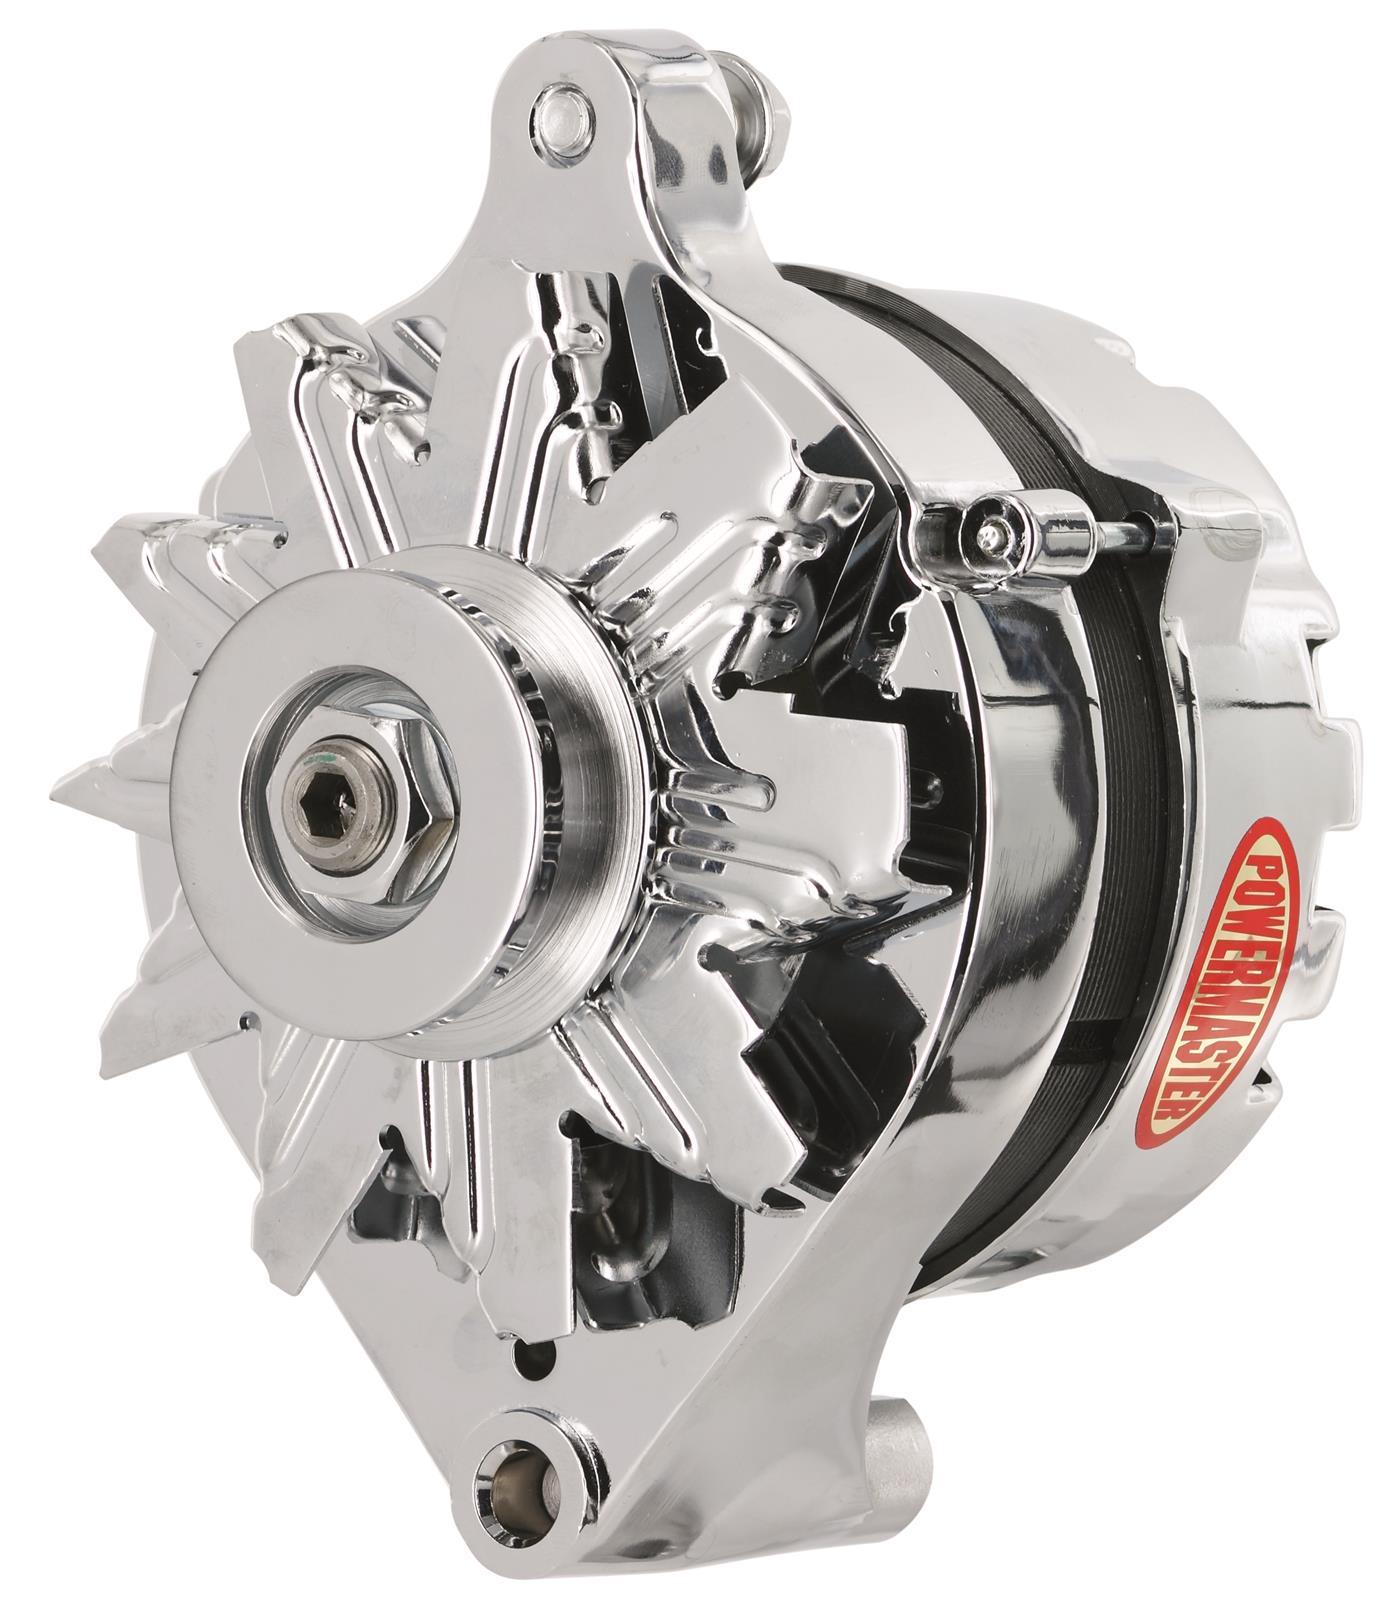 hight resolution of cj7 powermaster street alternators 17078 free shipping on orders over 99 at summit racing